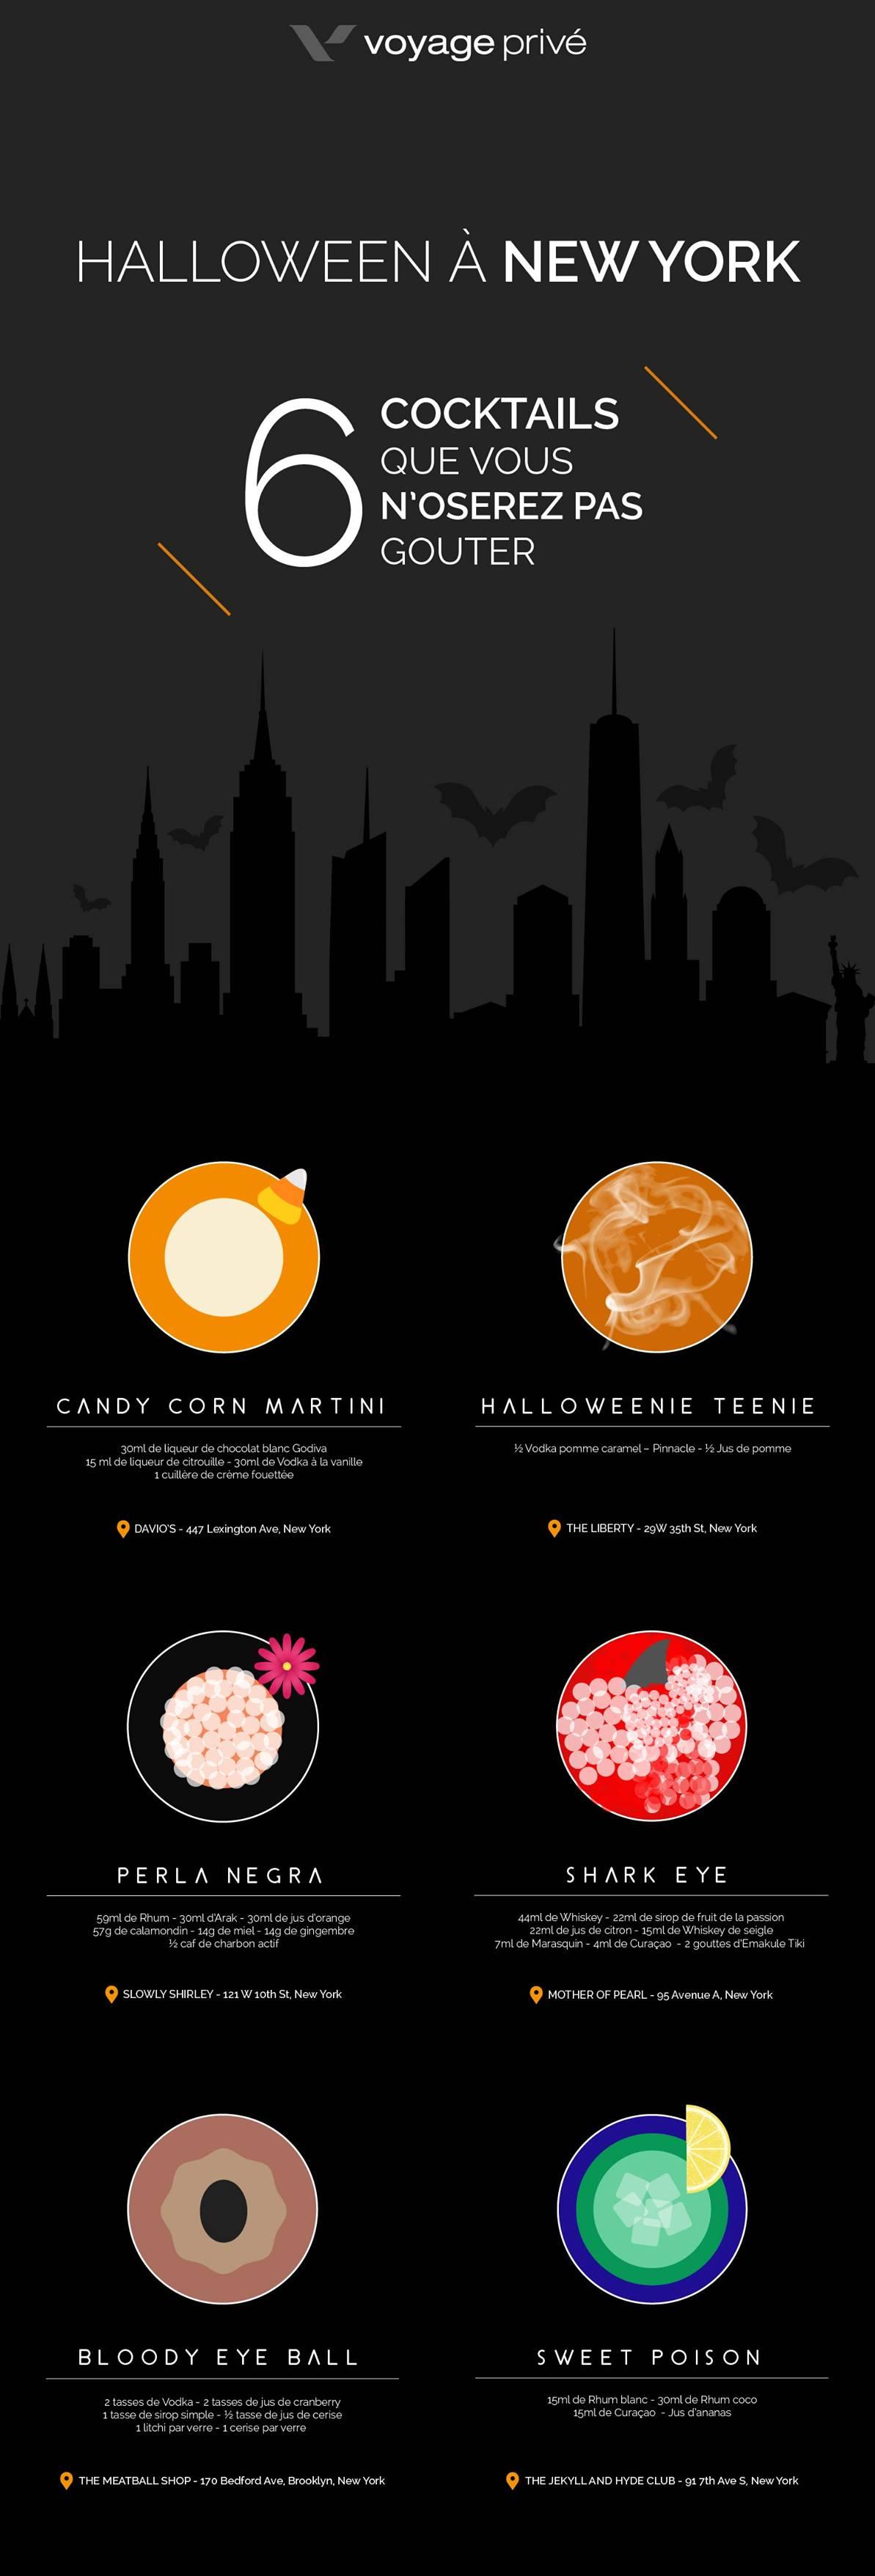 Cocktail pour Halloween à New York